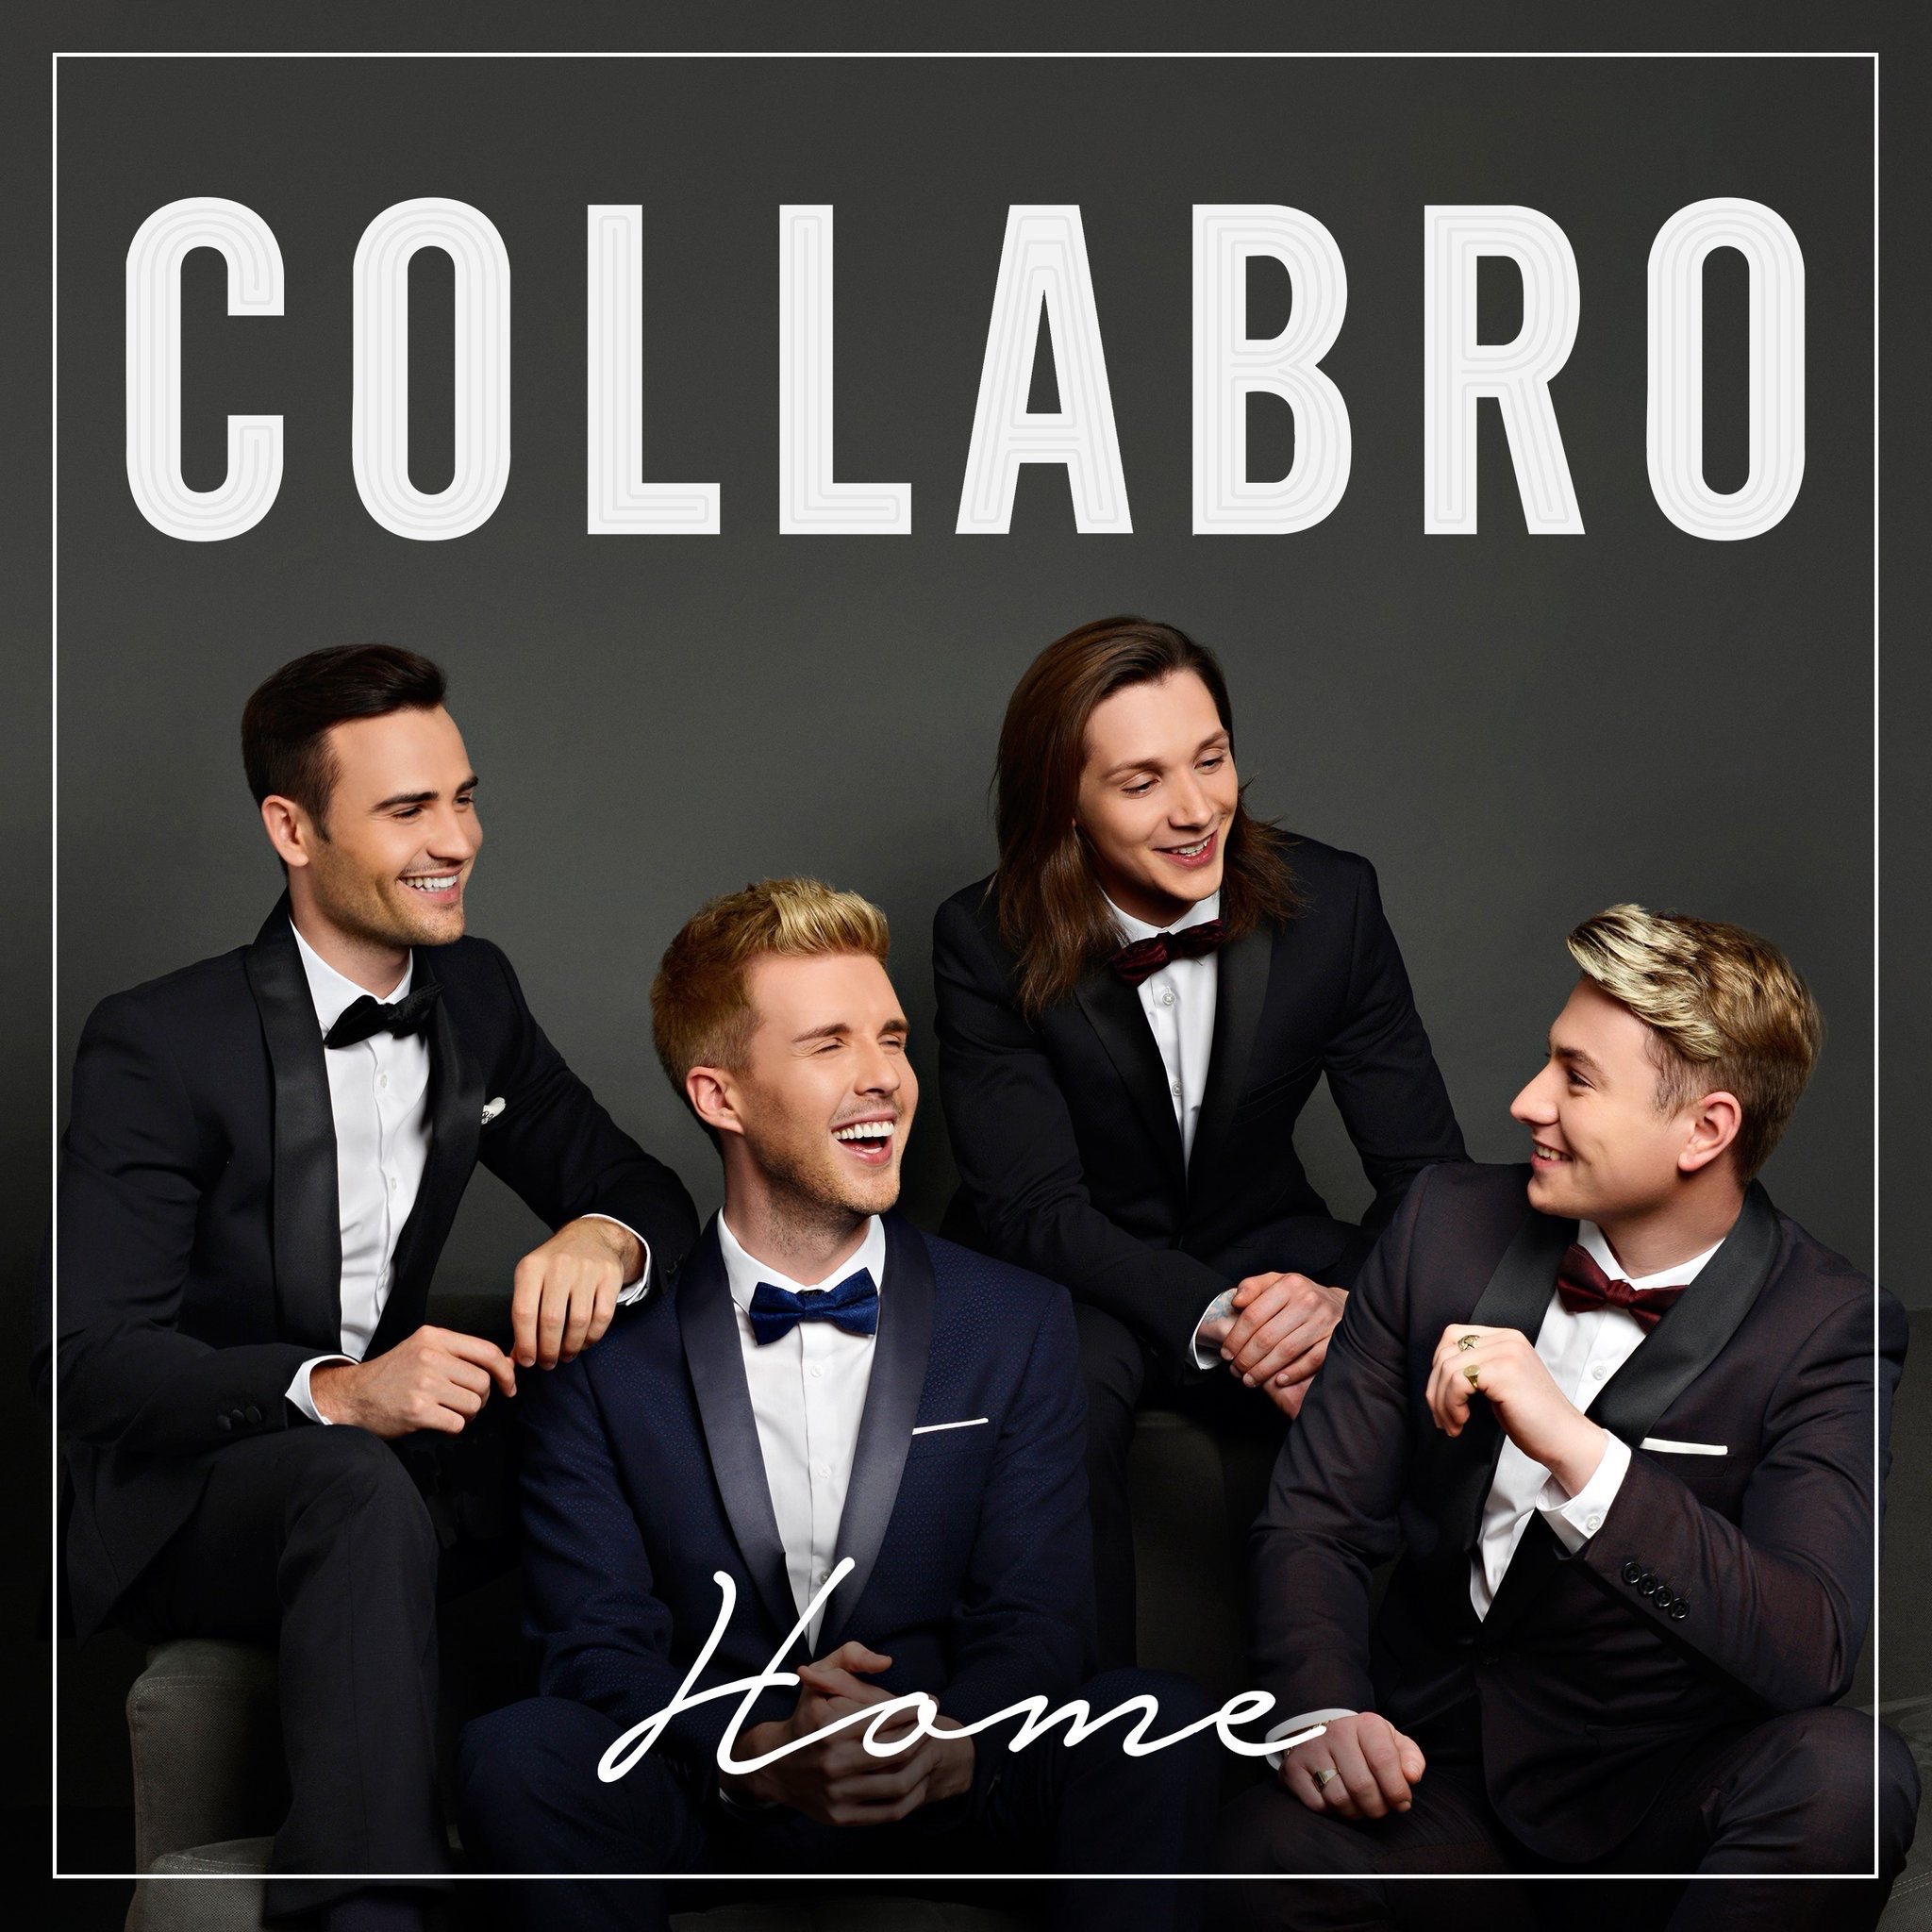 COLLABRO - FAN ALBUM LAUNCH